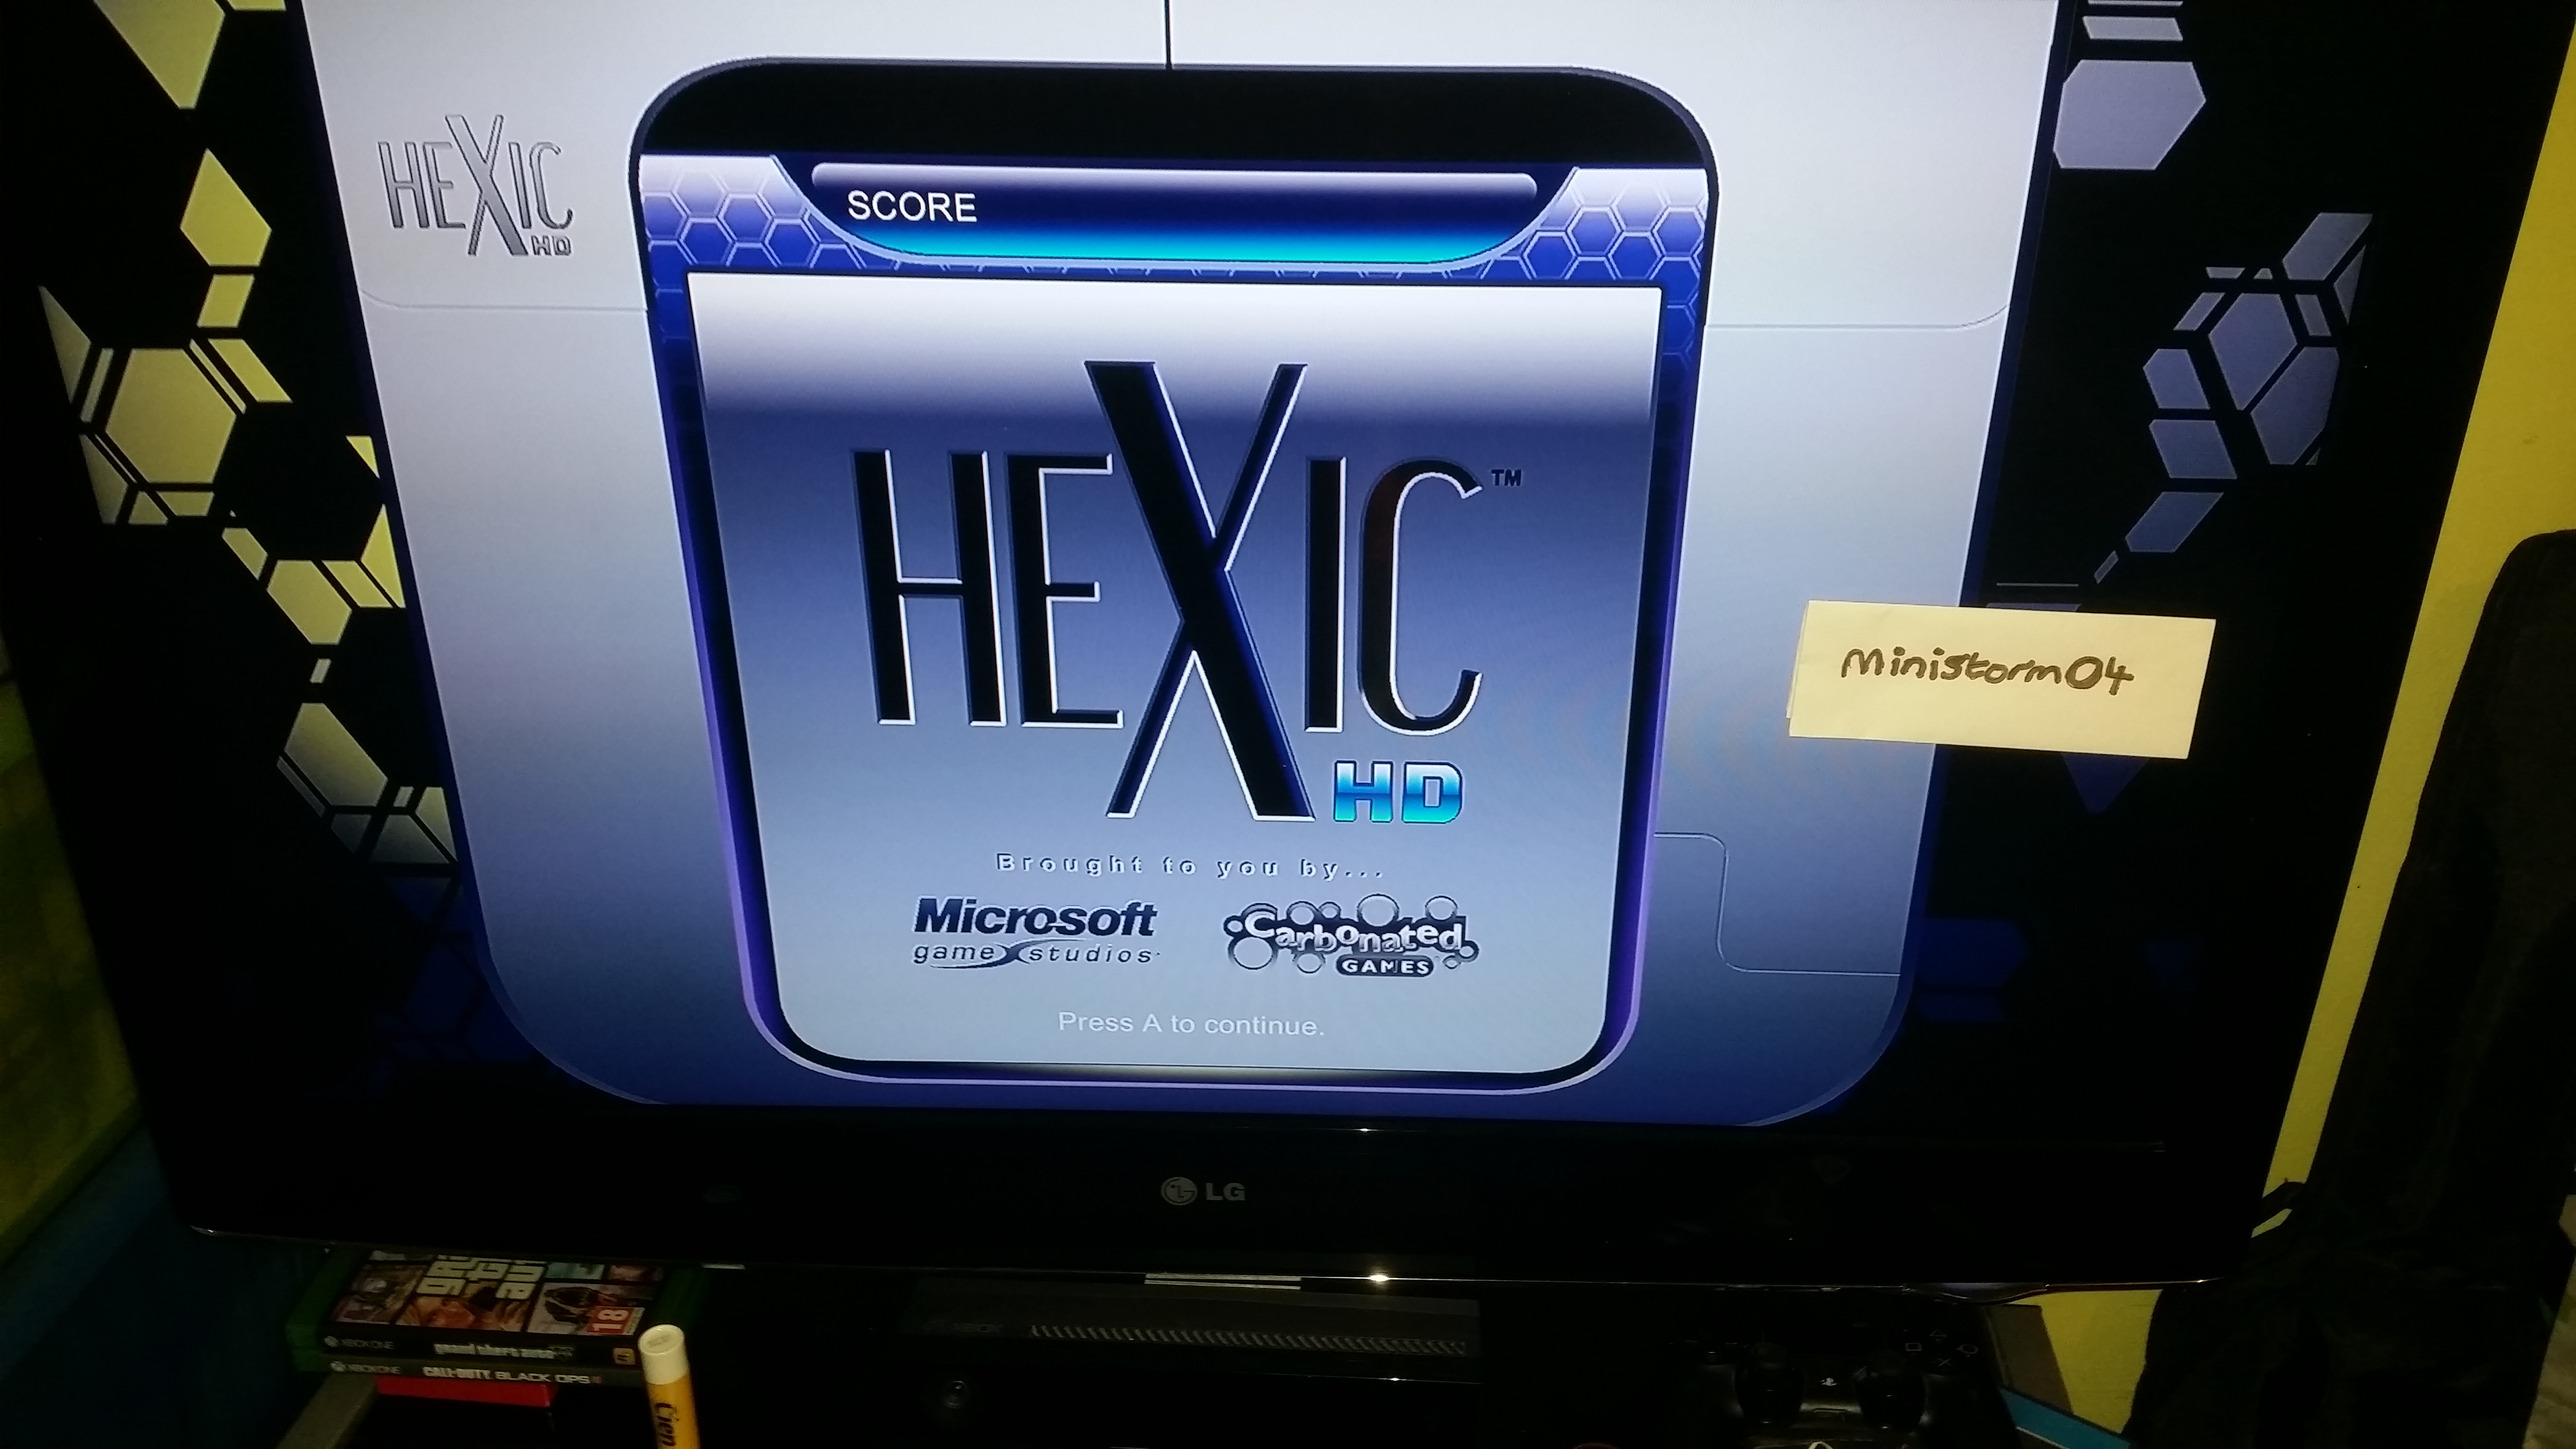 ministorm04: Hexic HD: Marathon (Xbox 360) 5,245 points on 2019-02-28 13:50:35